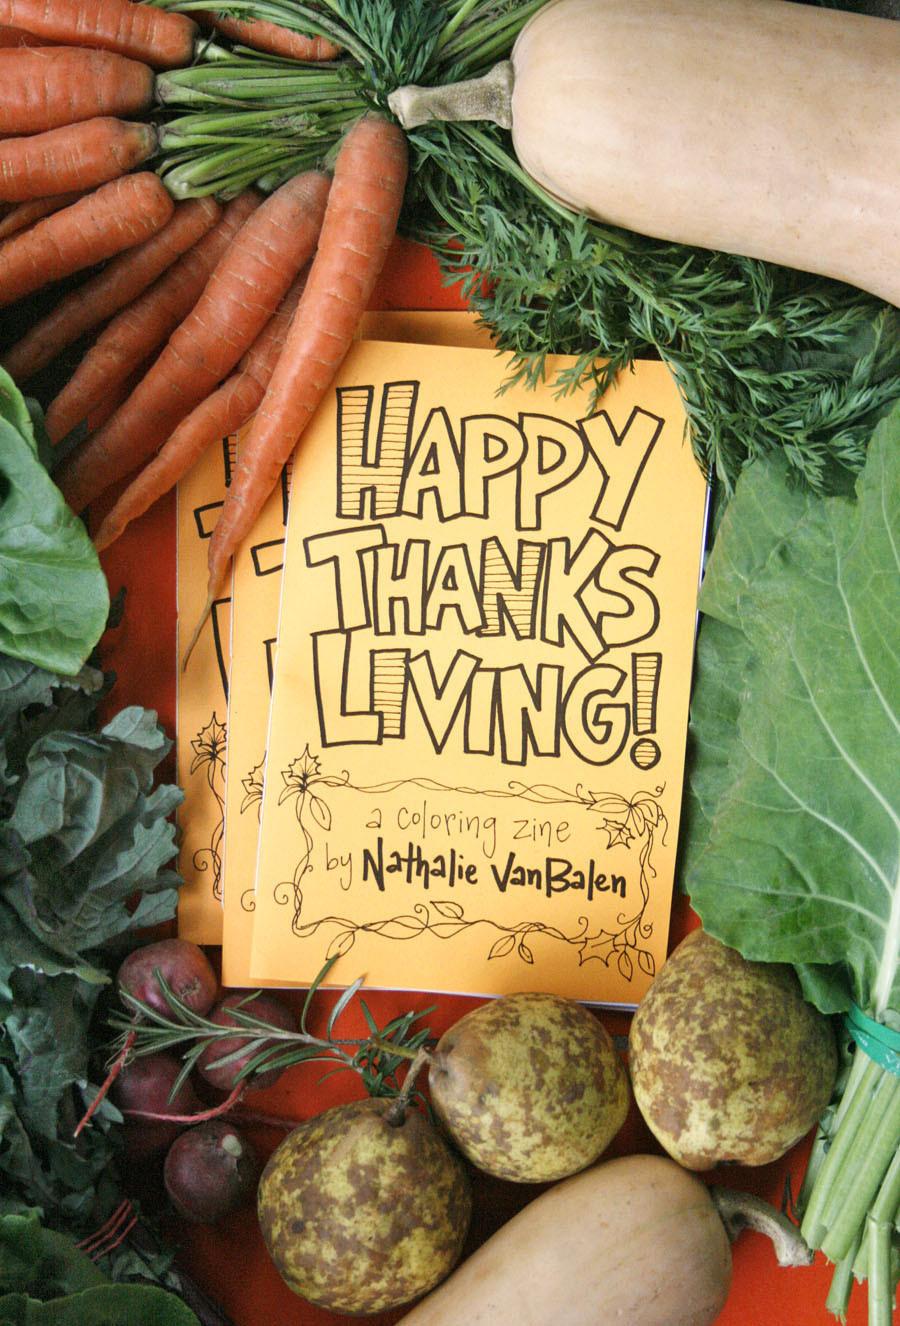 Happy Vegan Thanksgiving  Happy Thanksliving